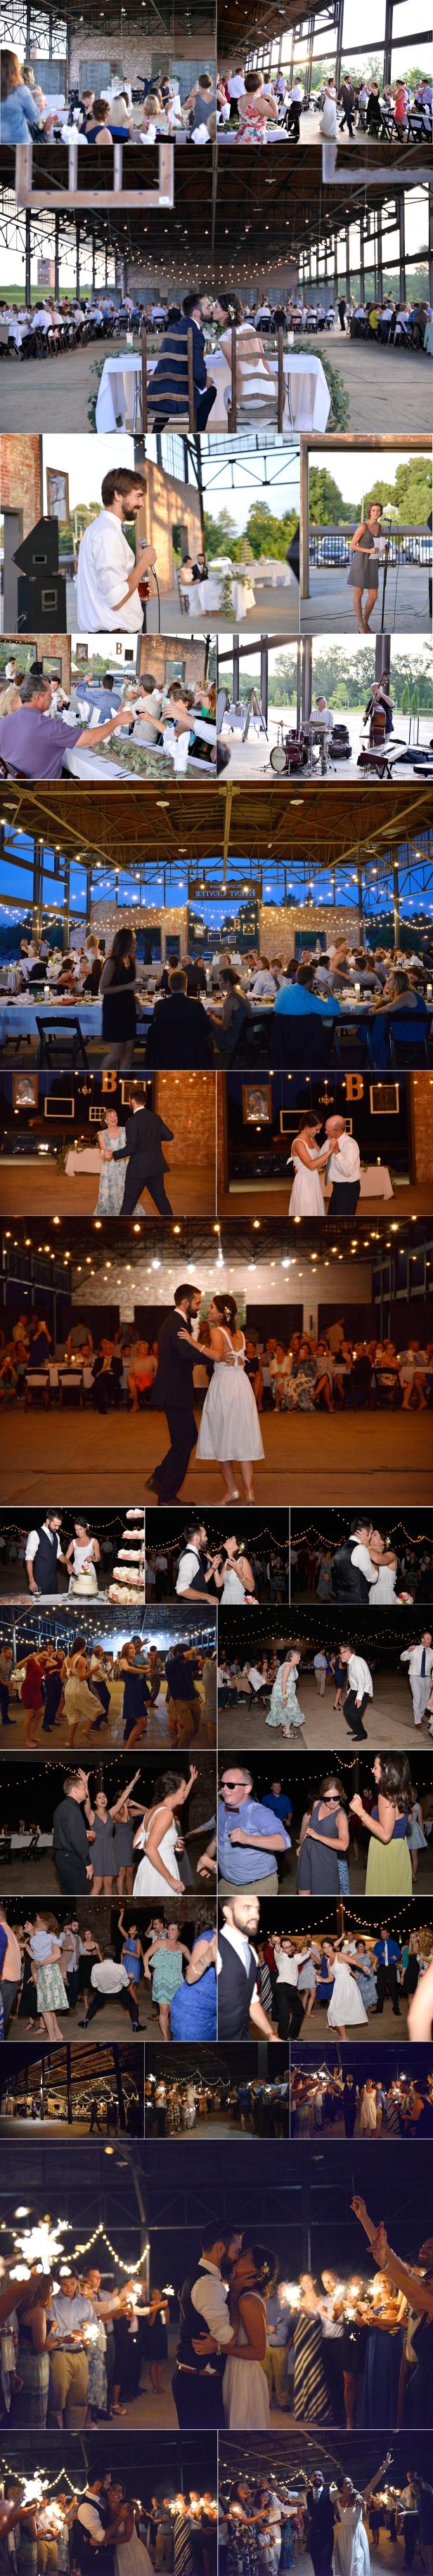 8-foundation park, mount vernon Ohio wedding